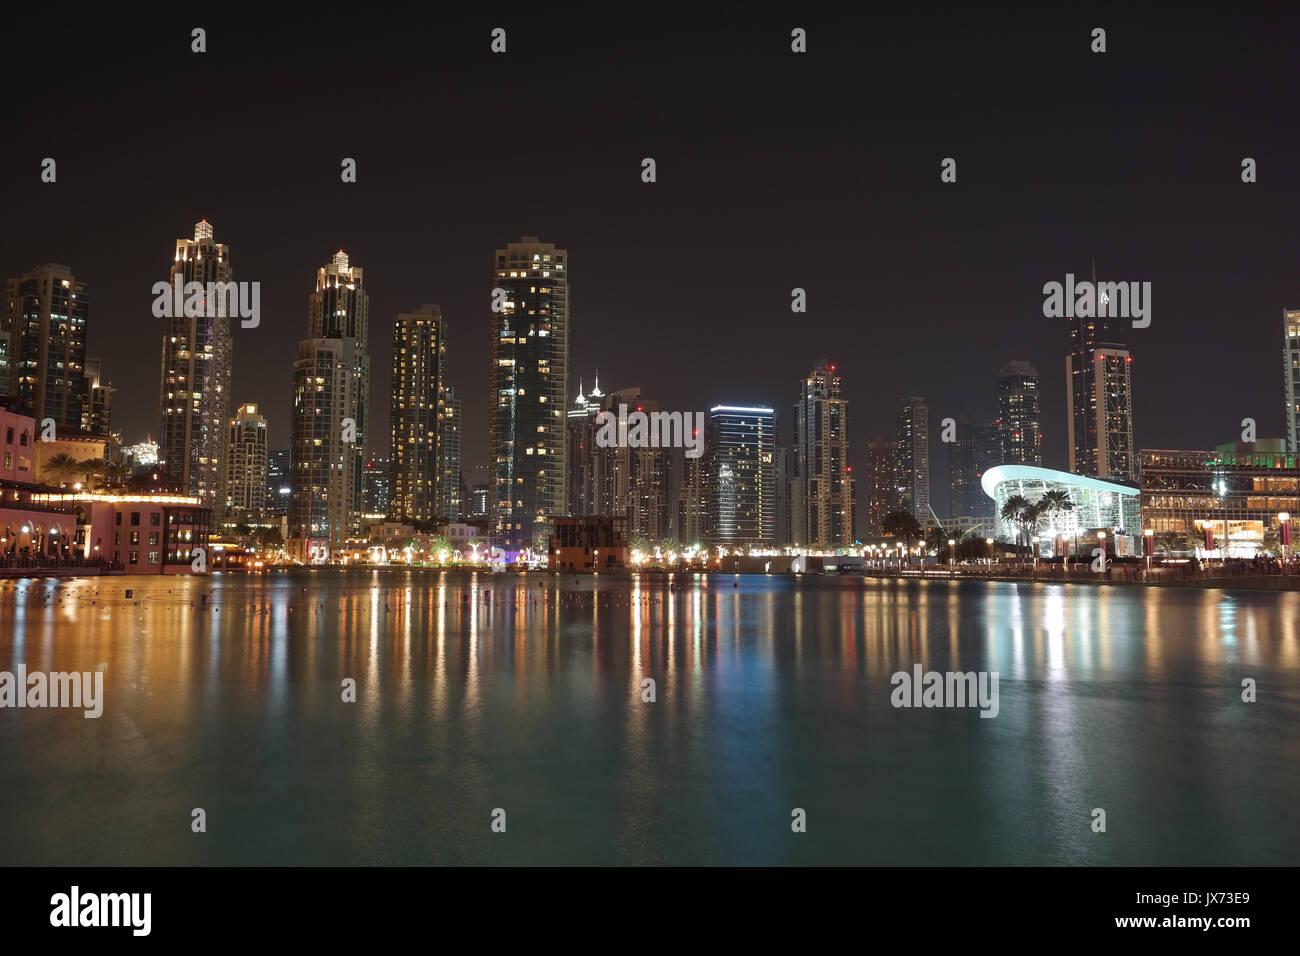 Souk Al Bahar shopping center at nighttime - Stock Image